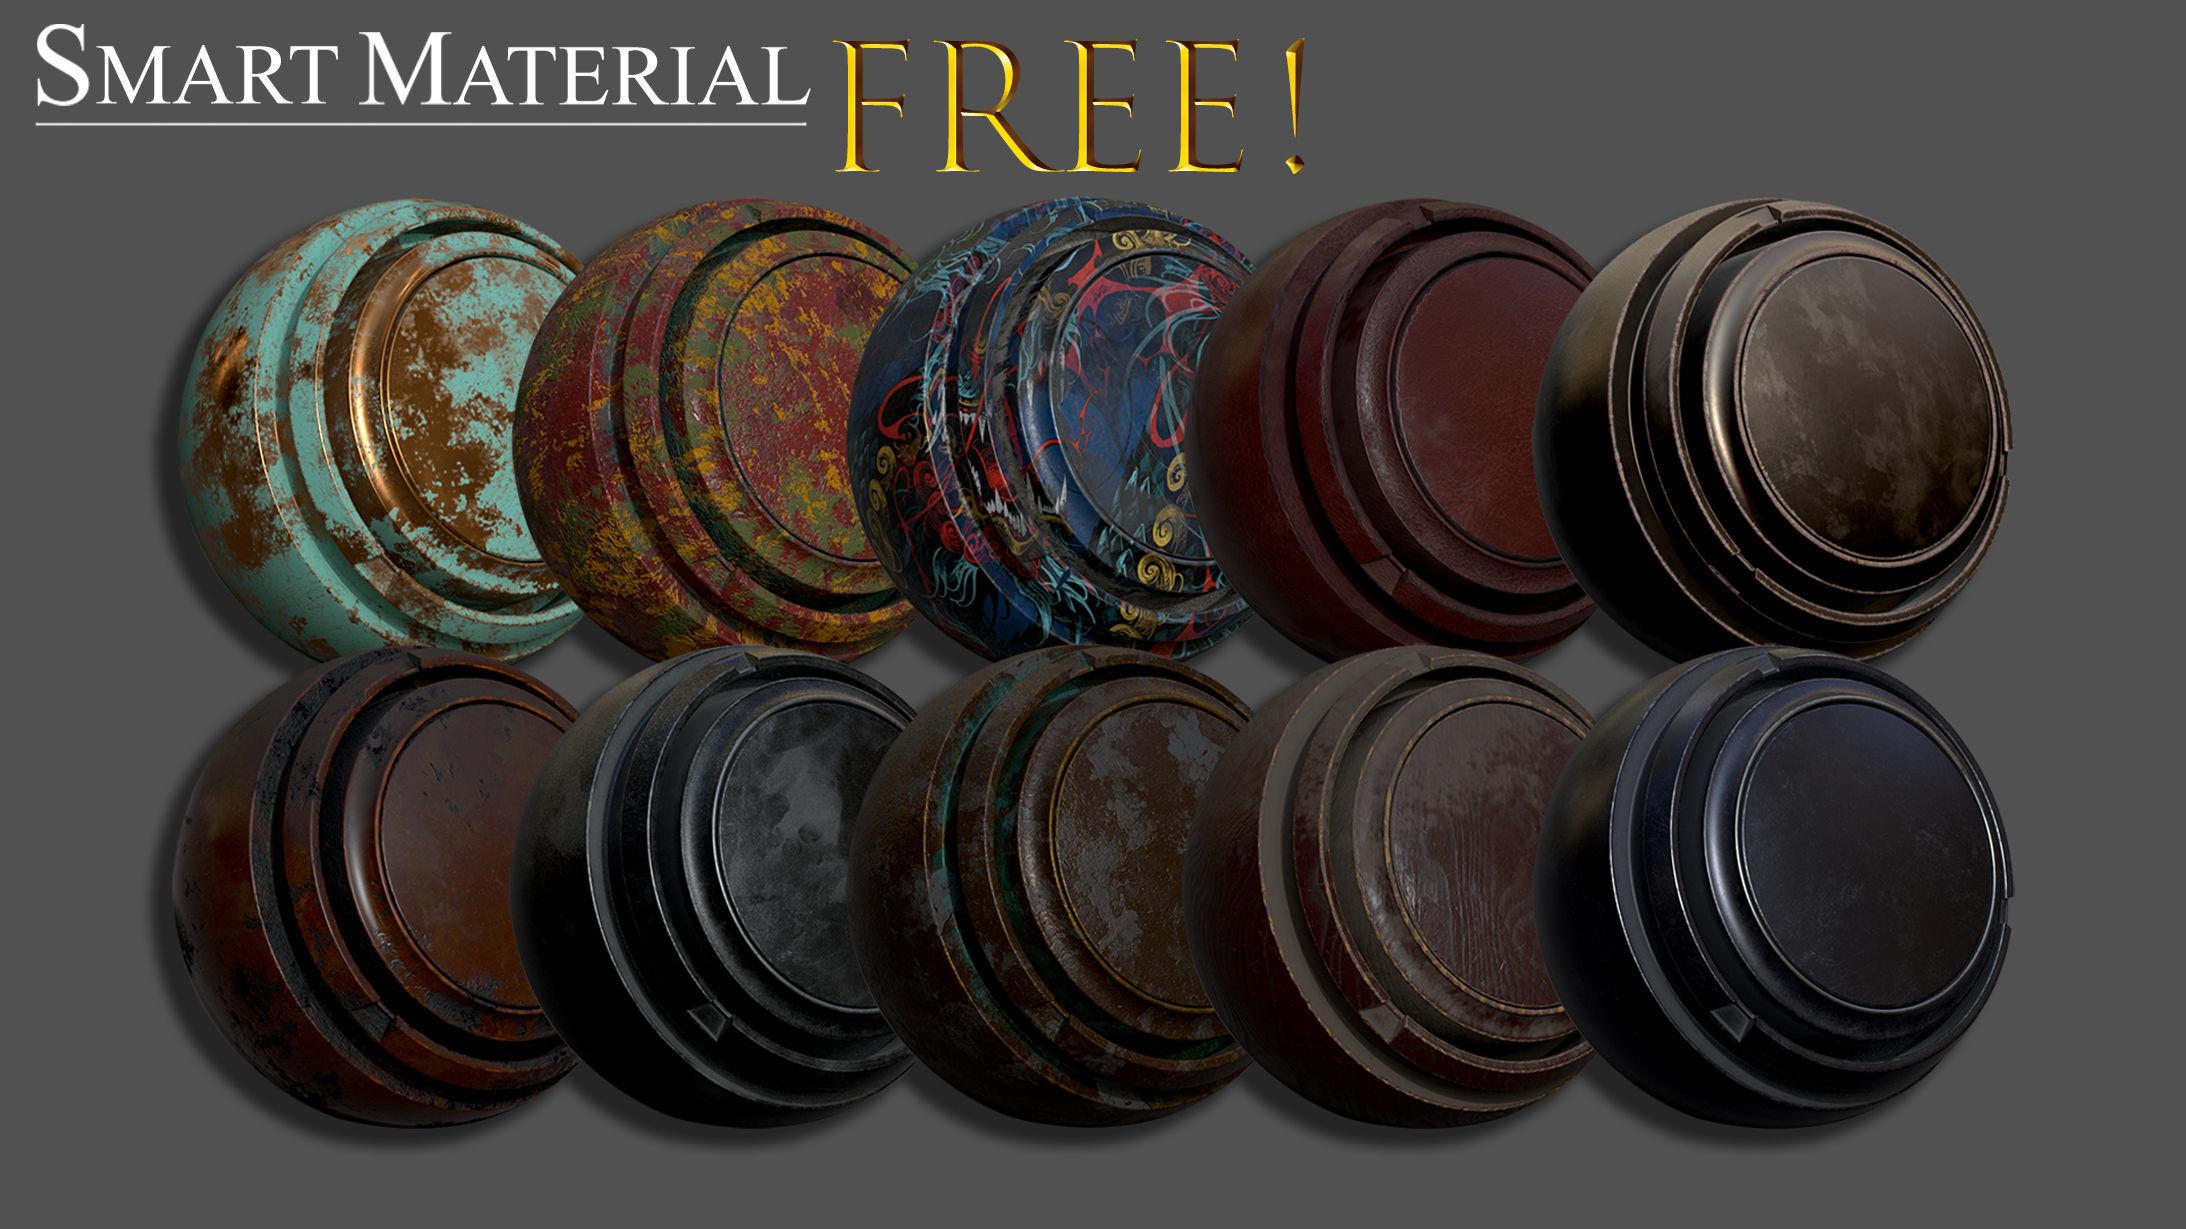 FREE Smart material